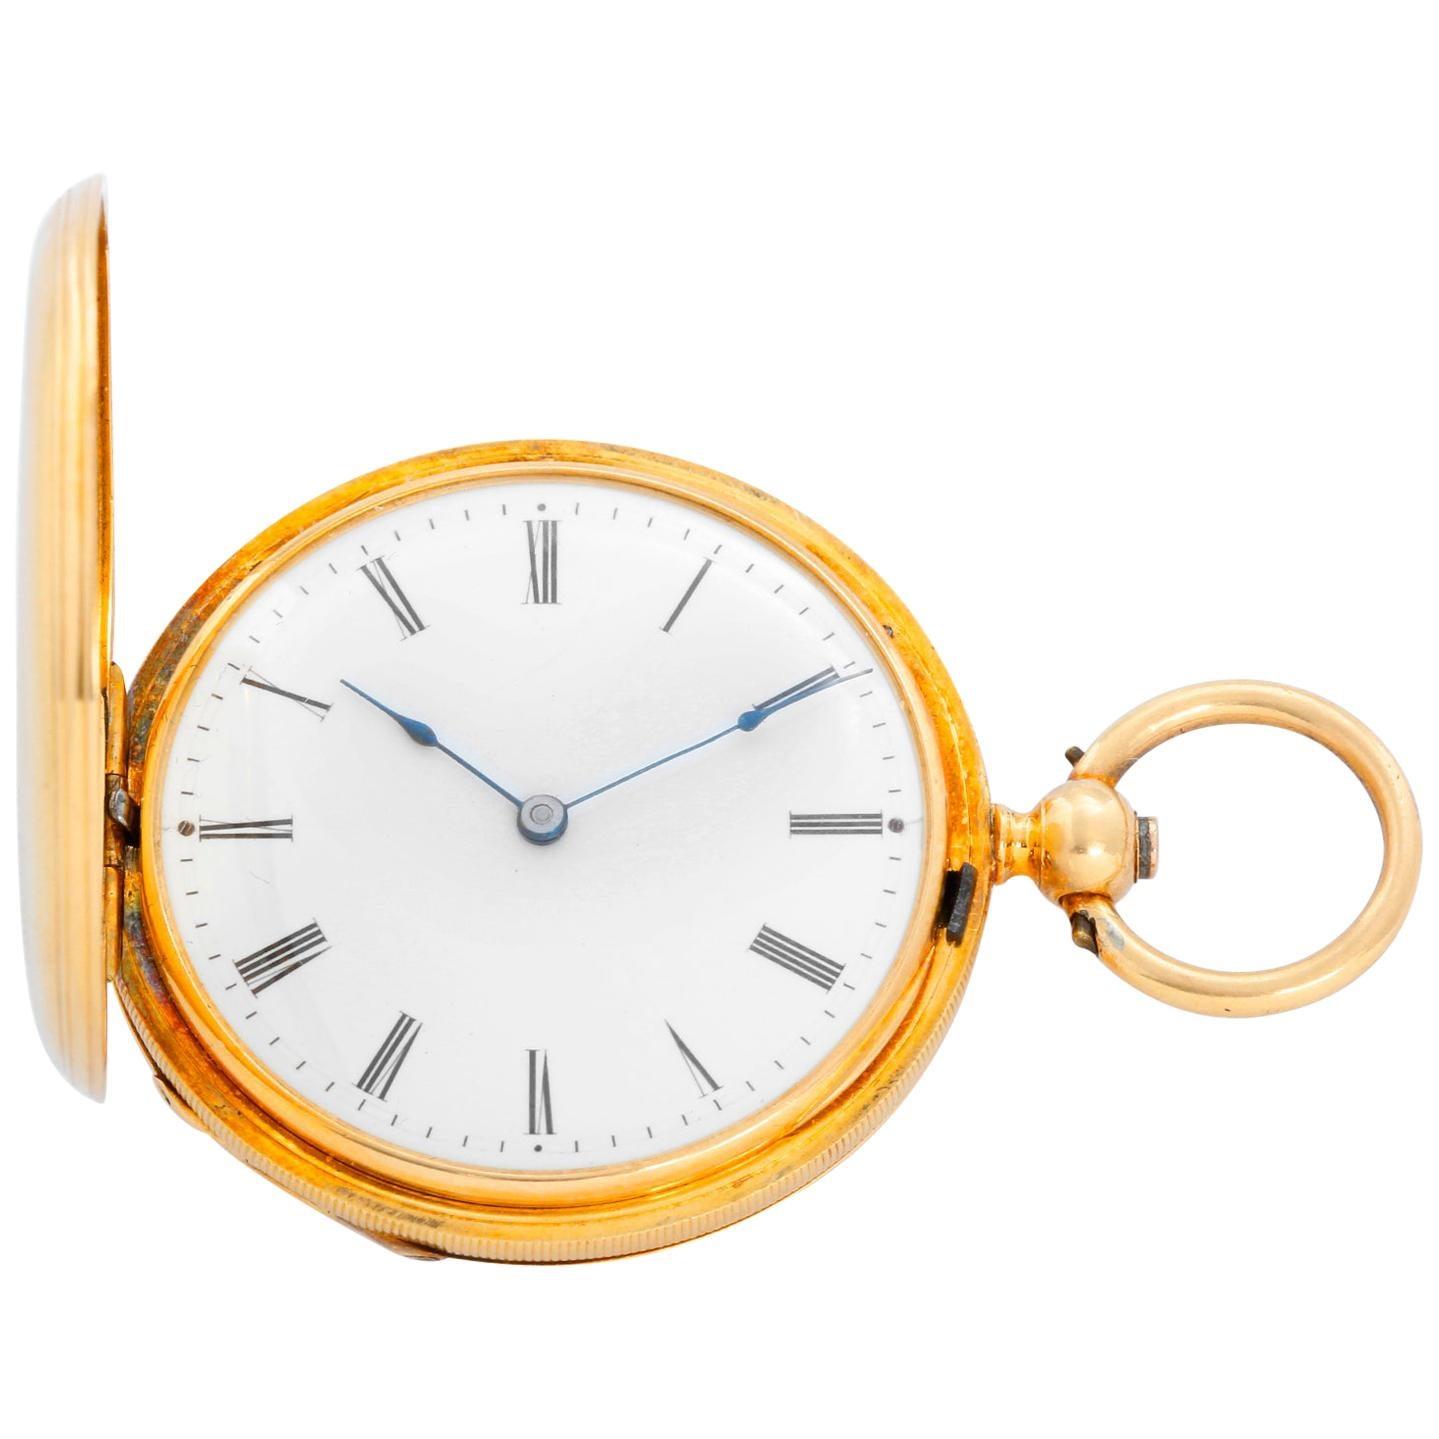 Patek Philippe for Tiffany & Co. Key Wind Pocket Watch